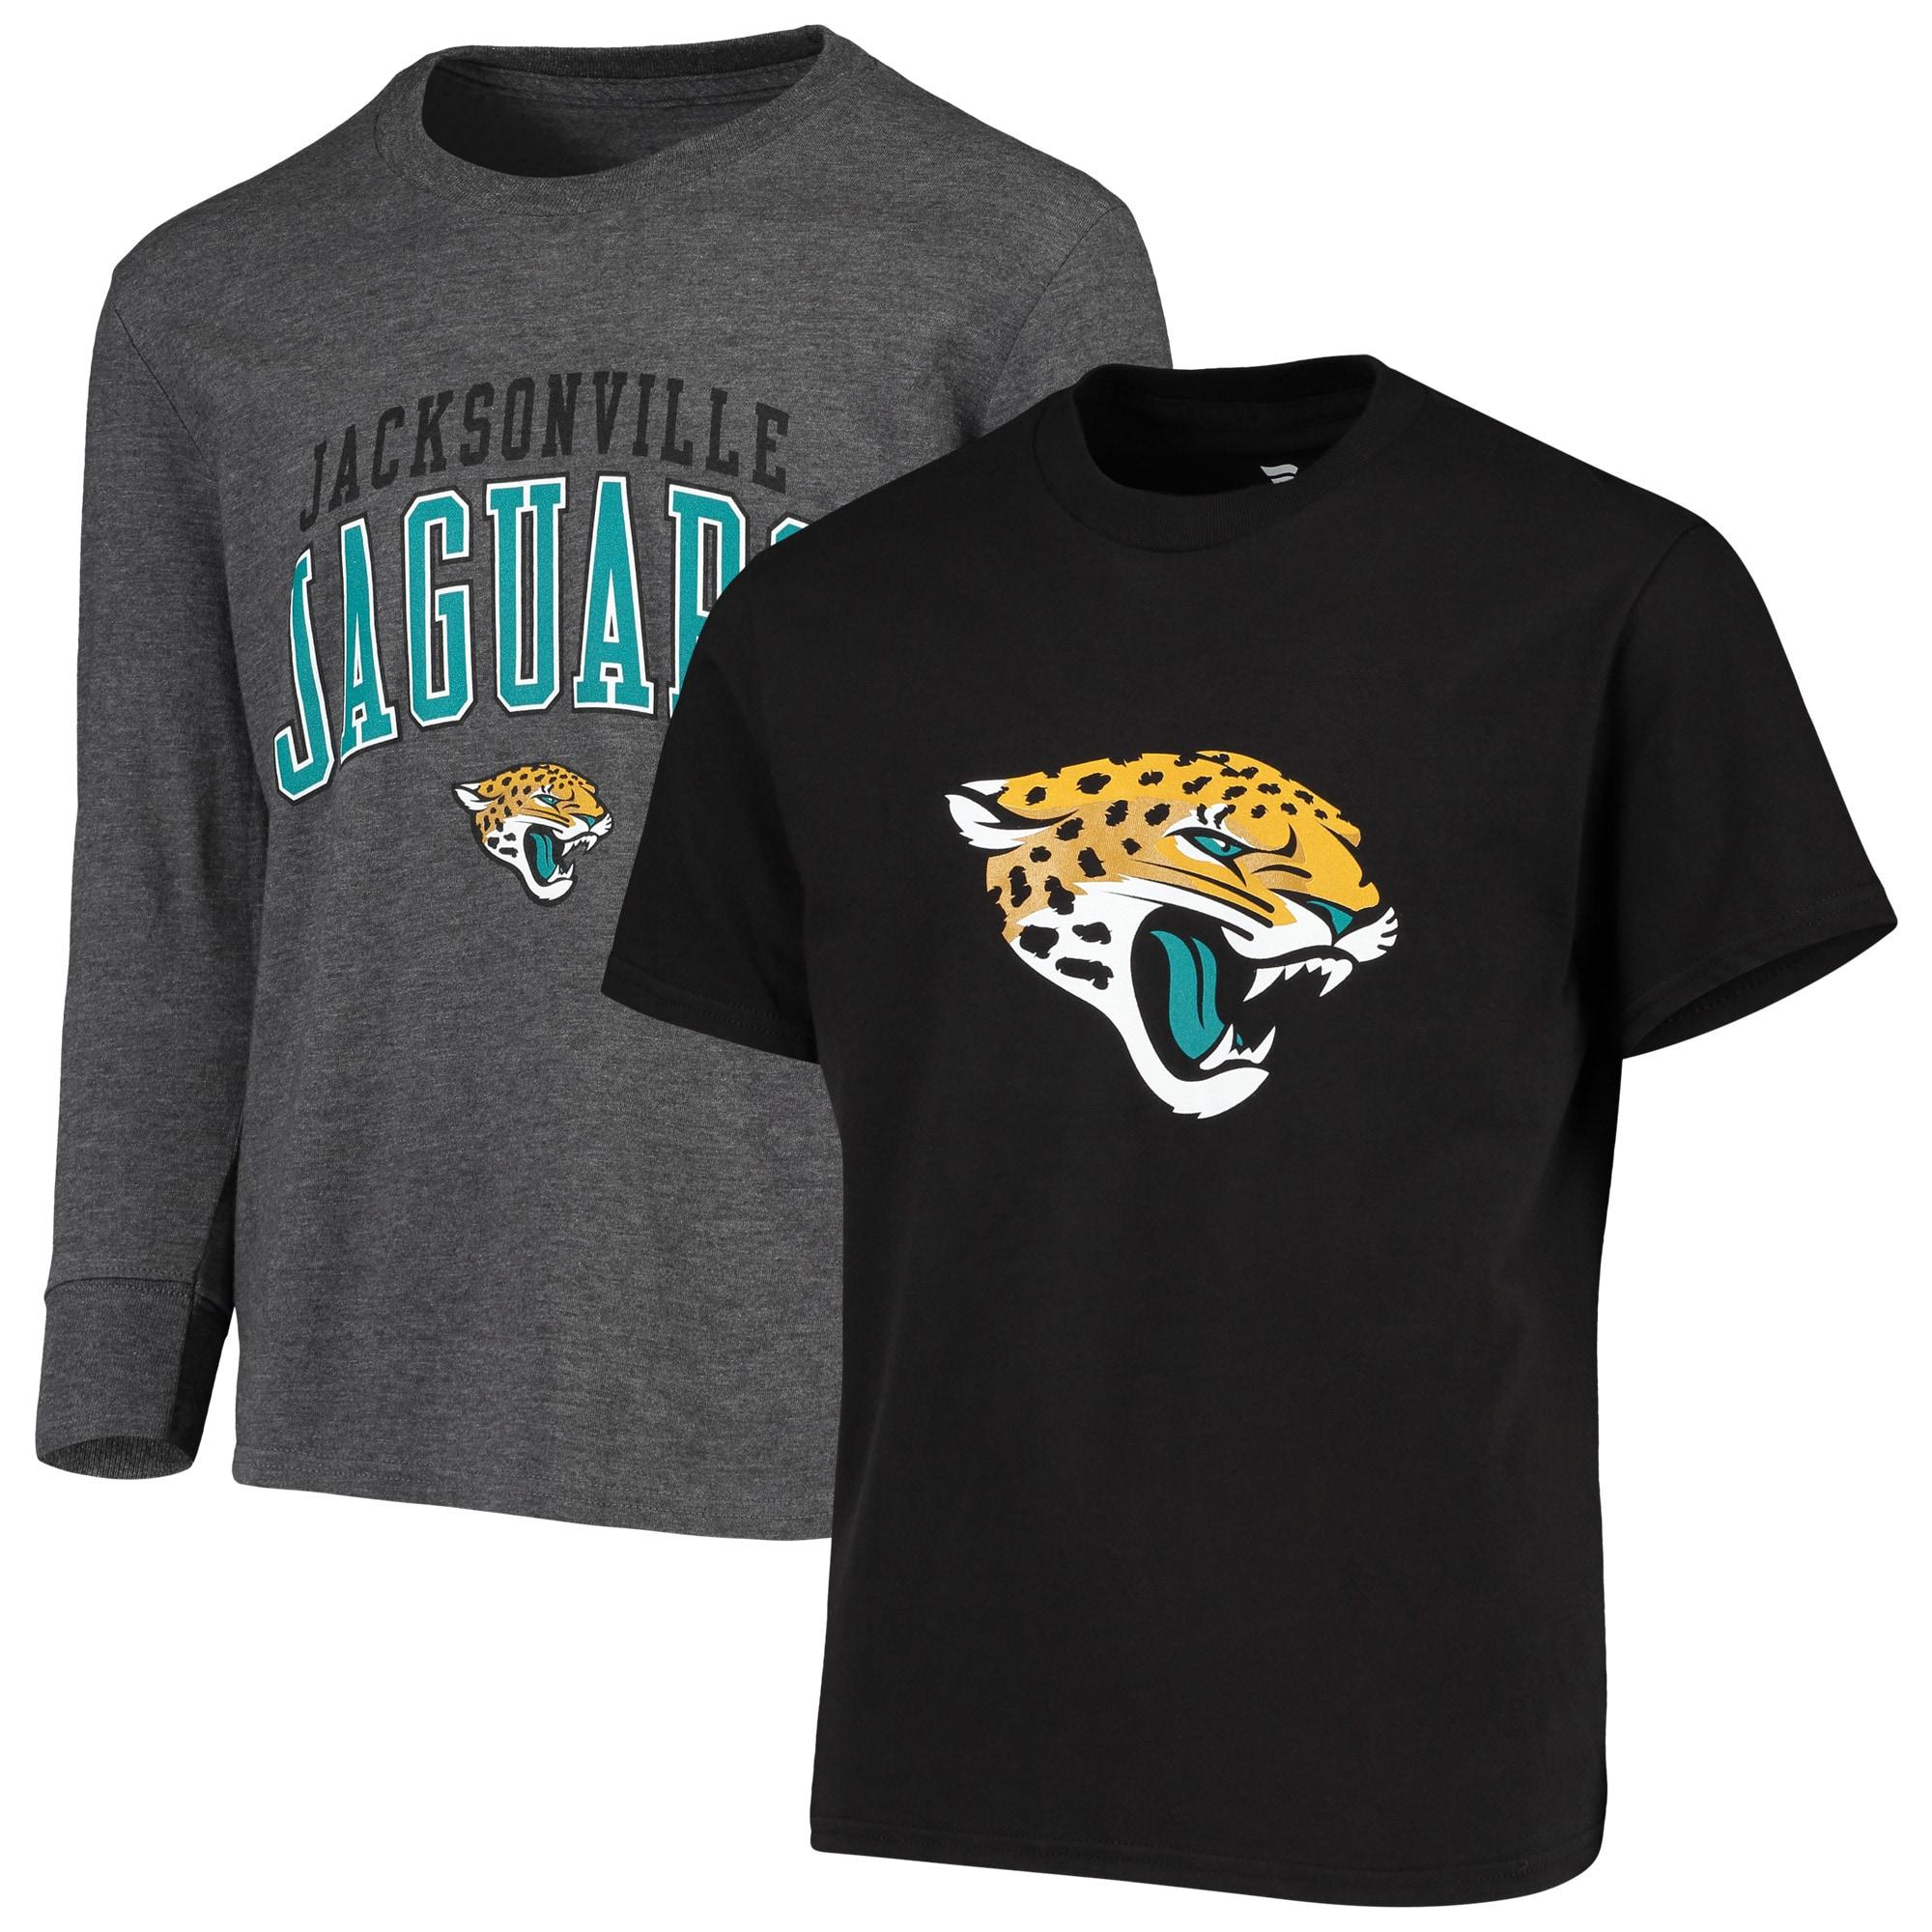 Jacksonville Jaguars NFL Pro Line by Fanatics Branded Youth Short Sleeve & Long Sleeve T-Shirt Combo Pack - Black/Gray